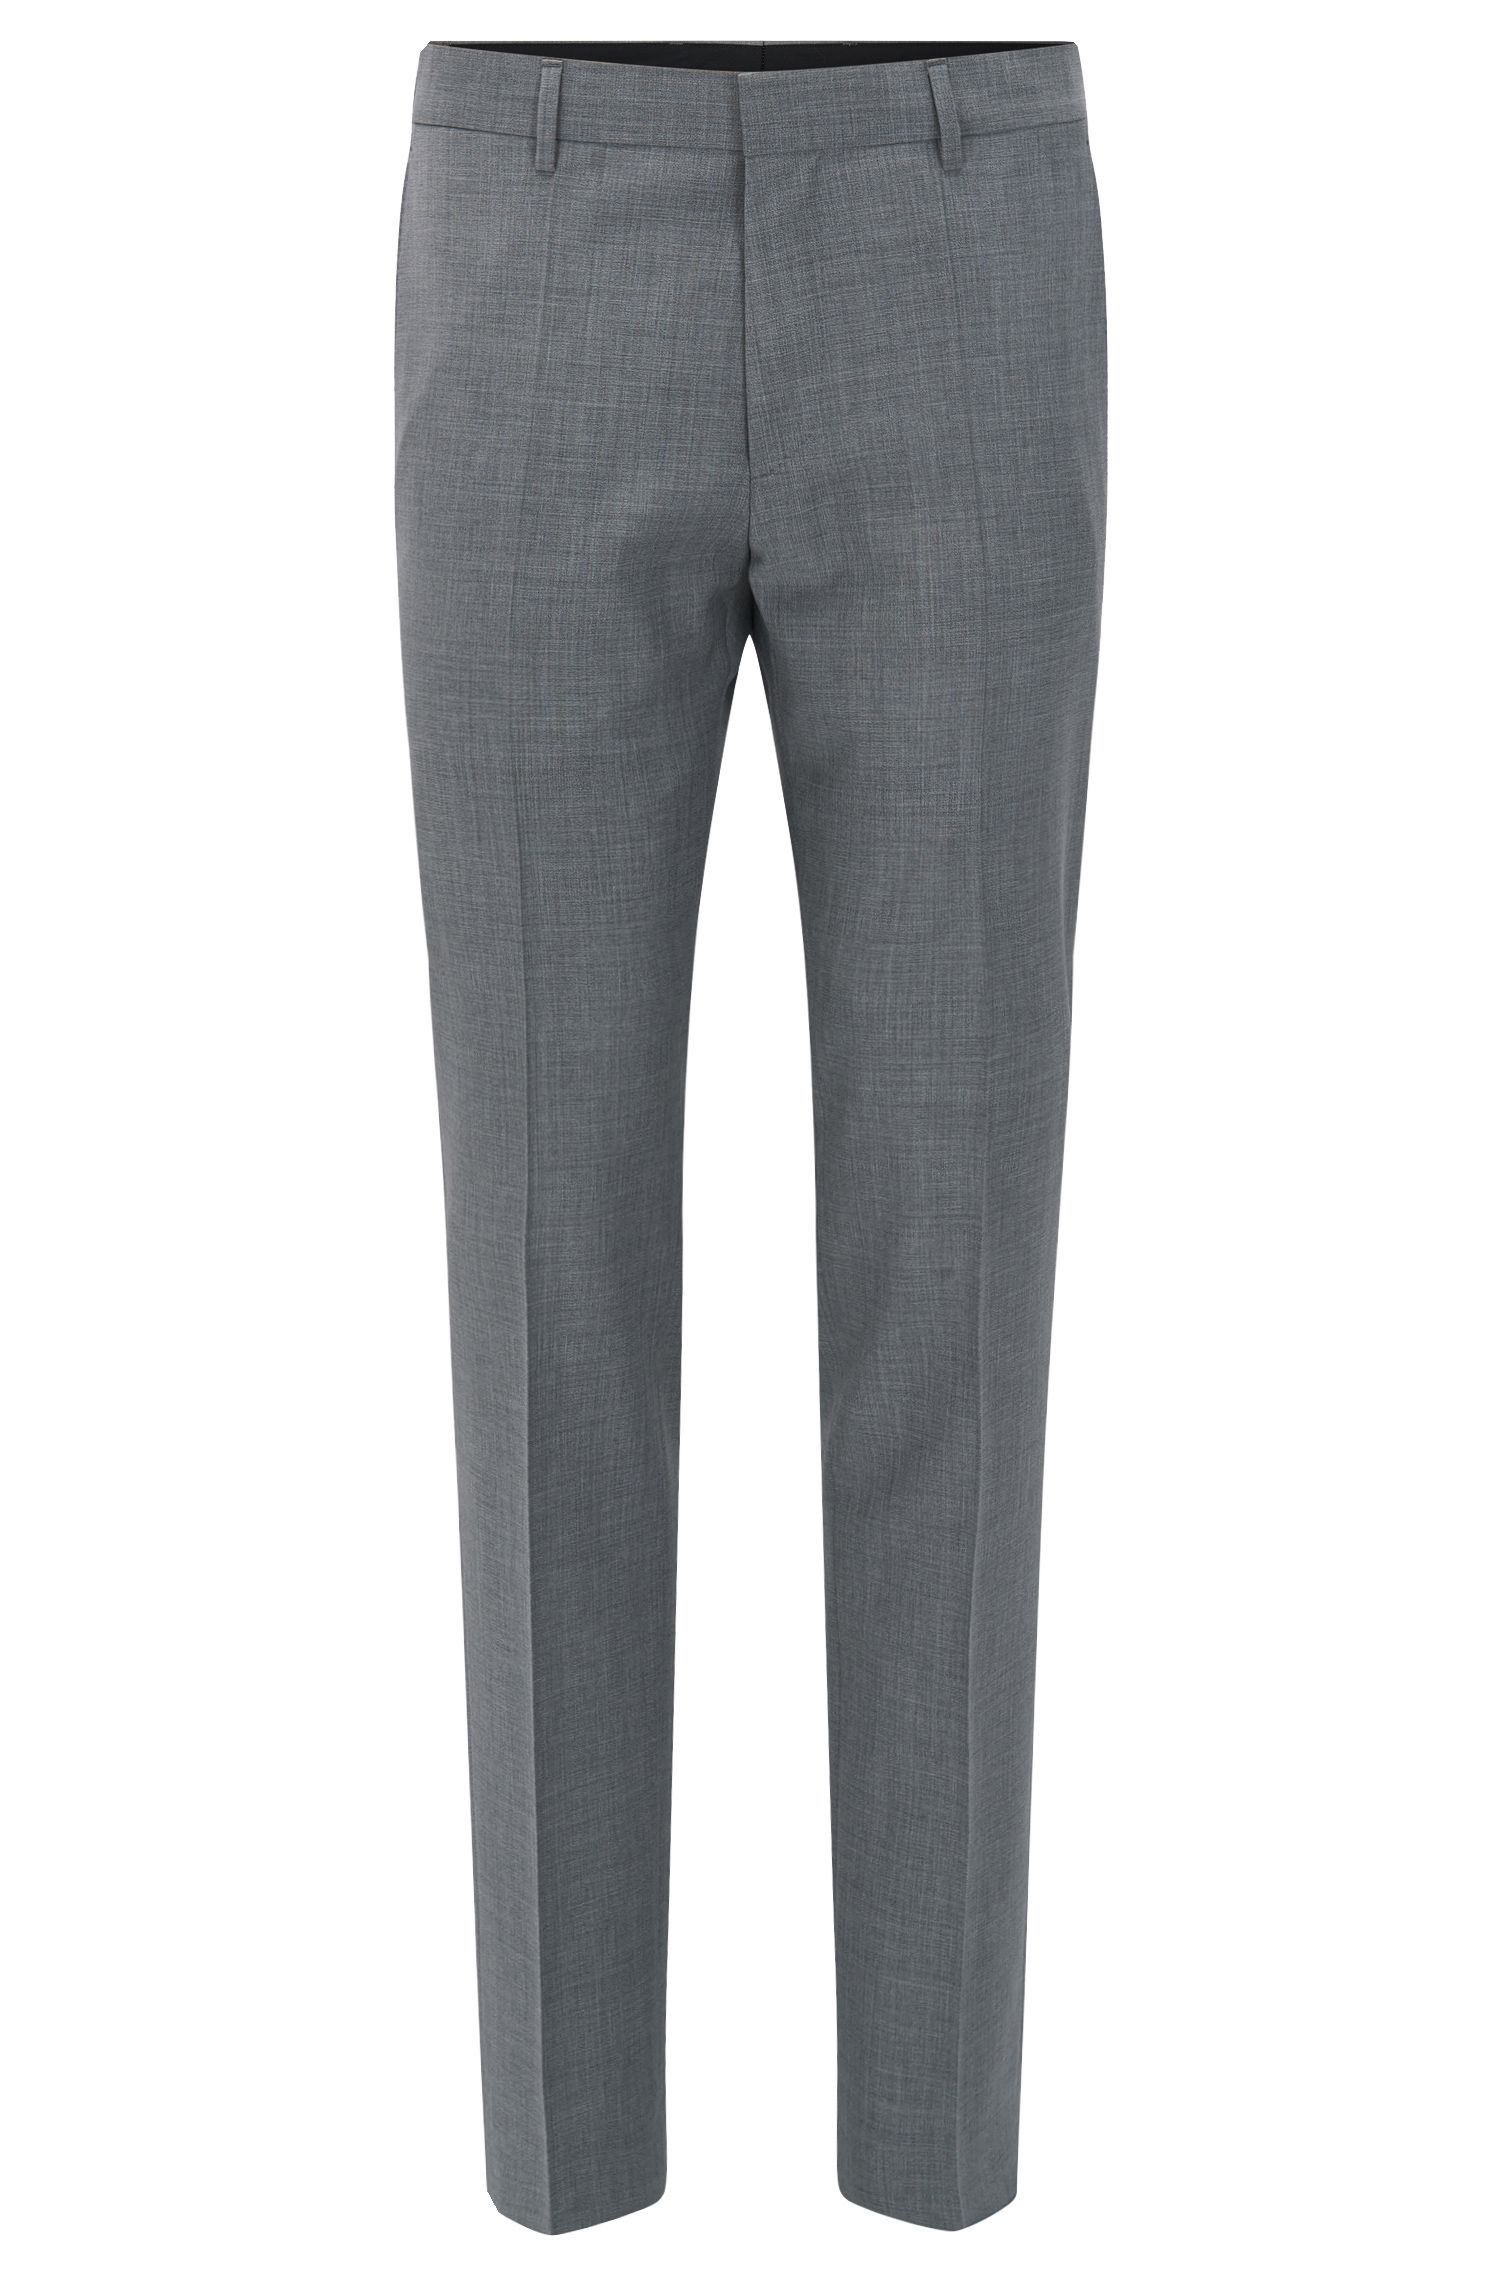 Virgin Wool Cashmere Dress Pant, Slim Fit | Genesis